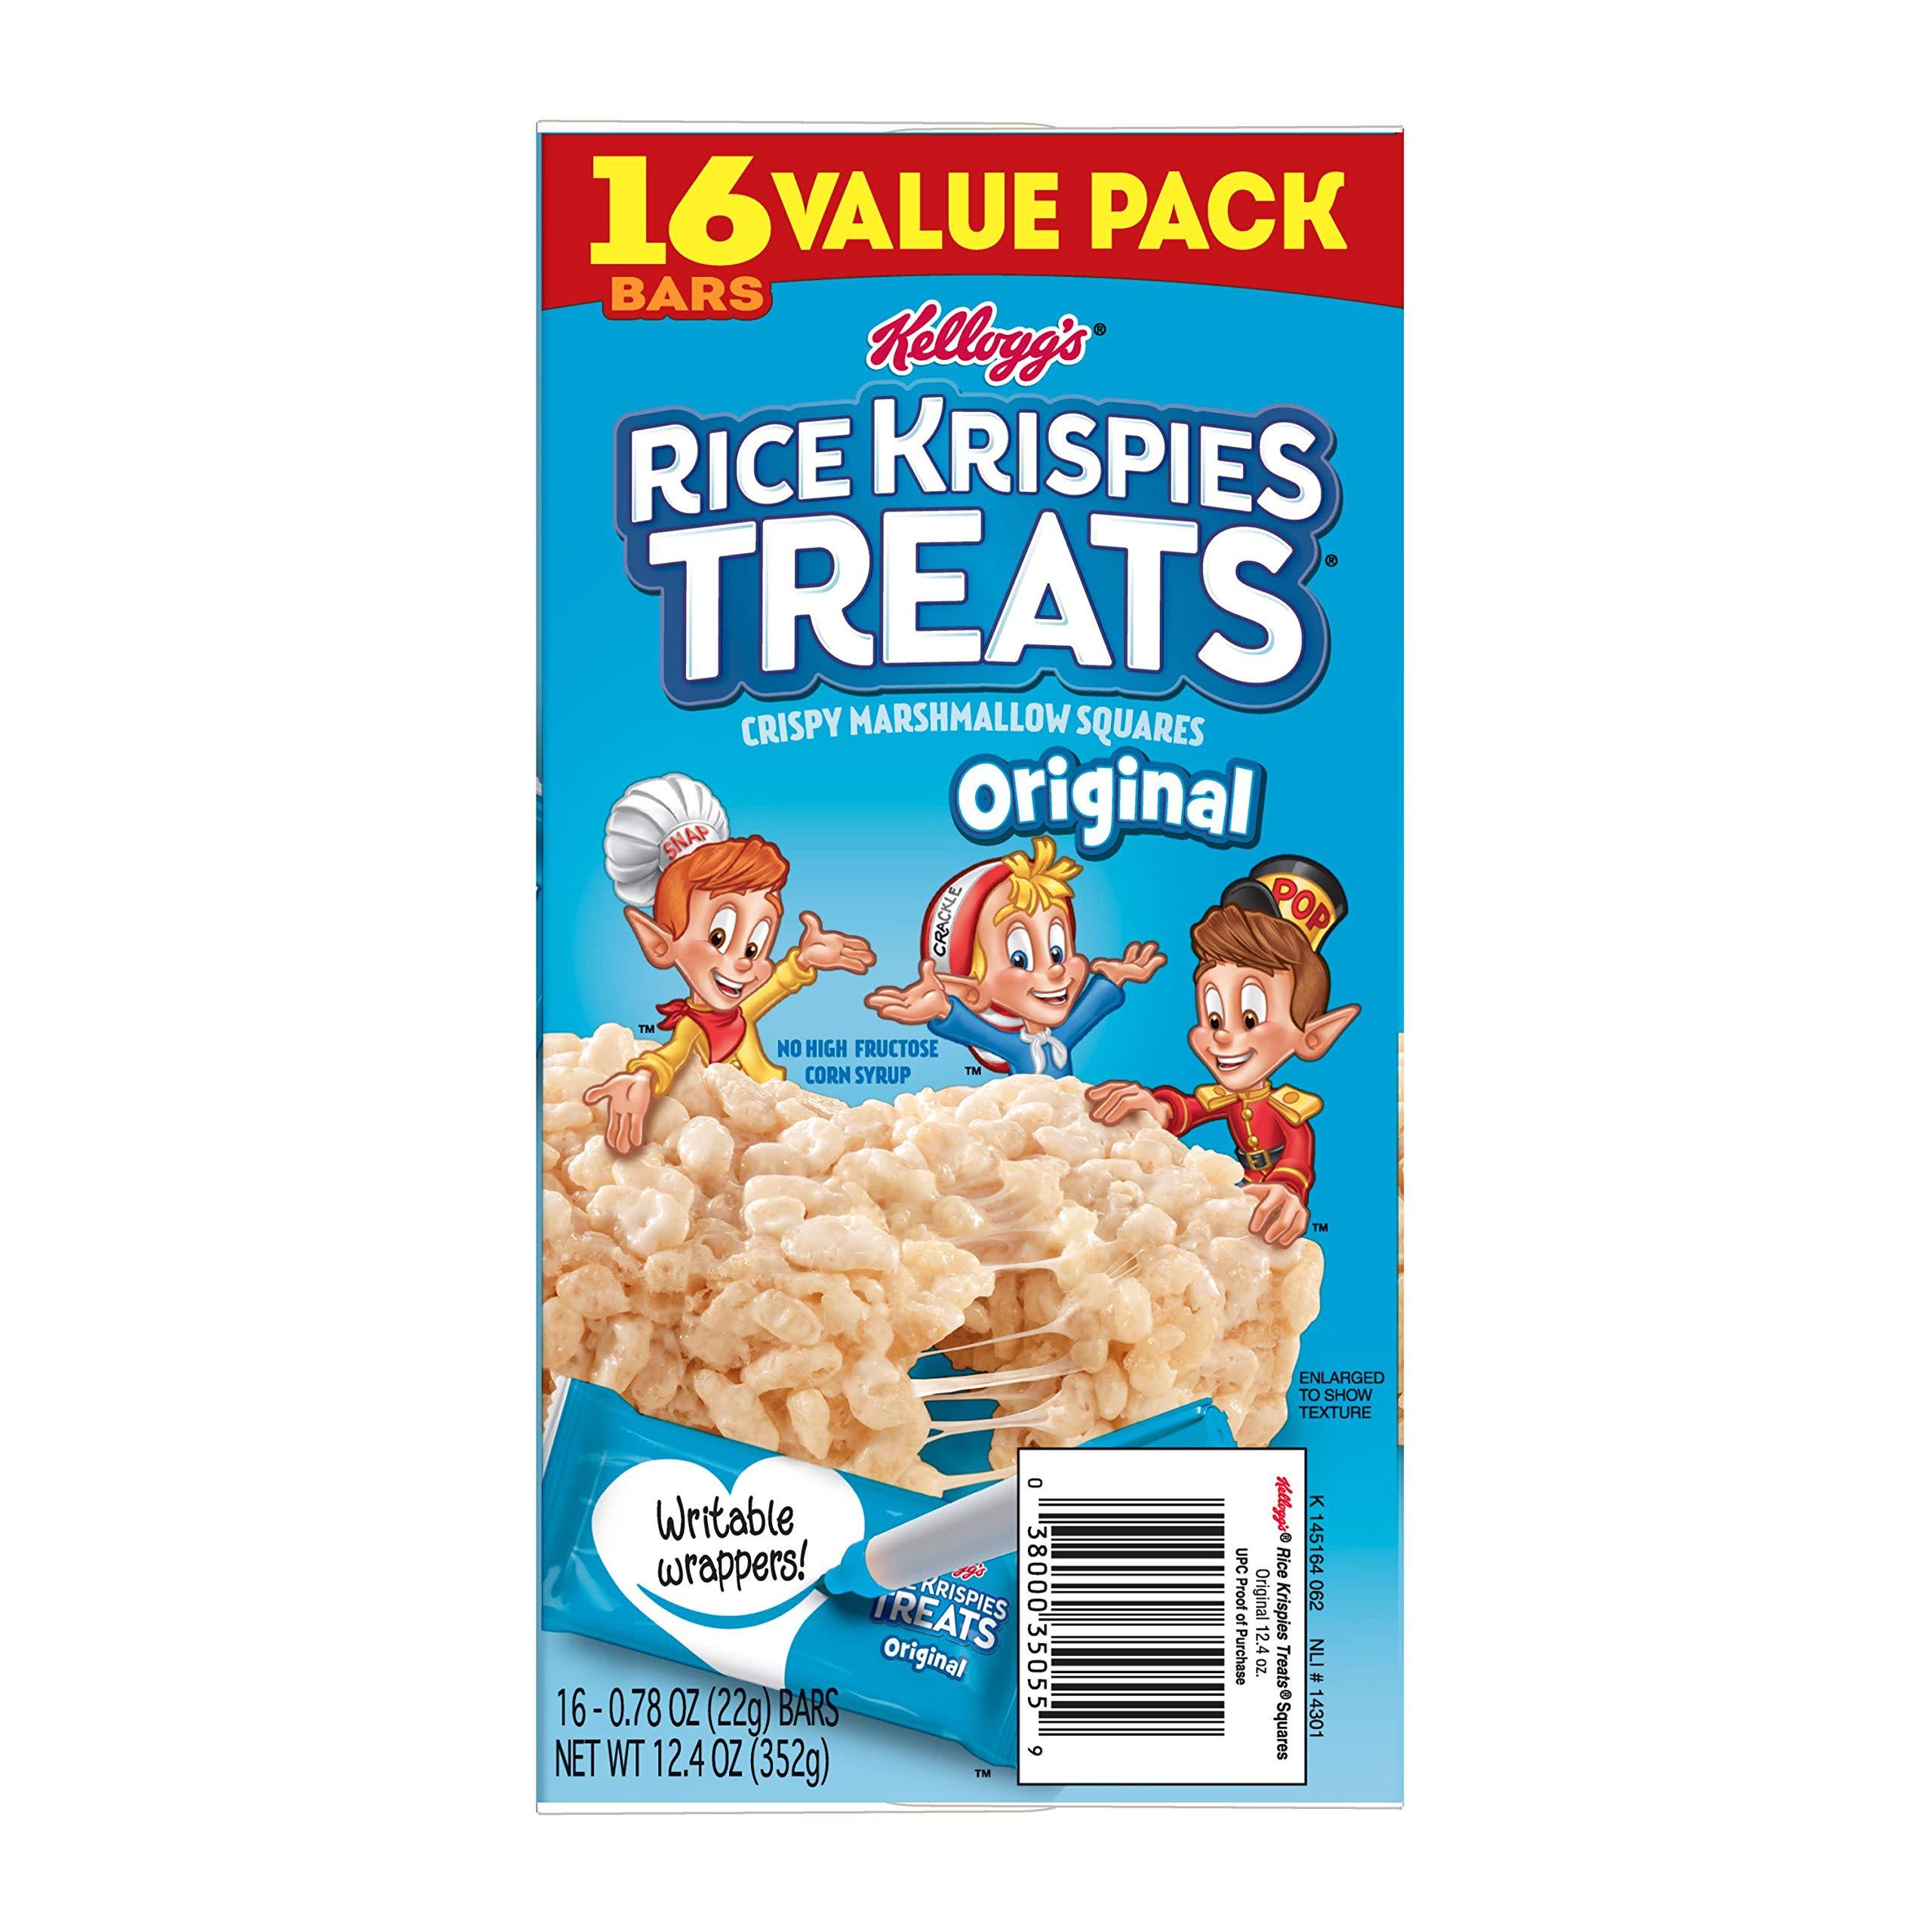 Kellogg's Rice Krispies Treats, Crispy Marshmallow Squares, Original, Value Pack, 0.78 oz Bars(16 Count) by Rice Krispies (Image #9)